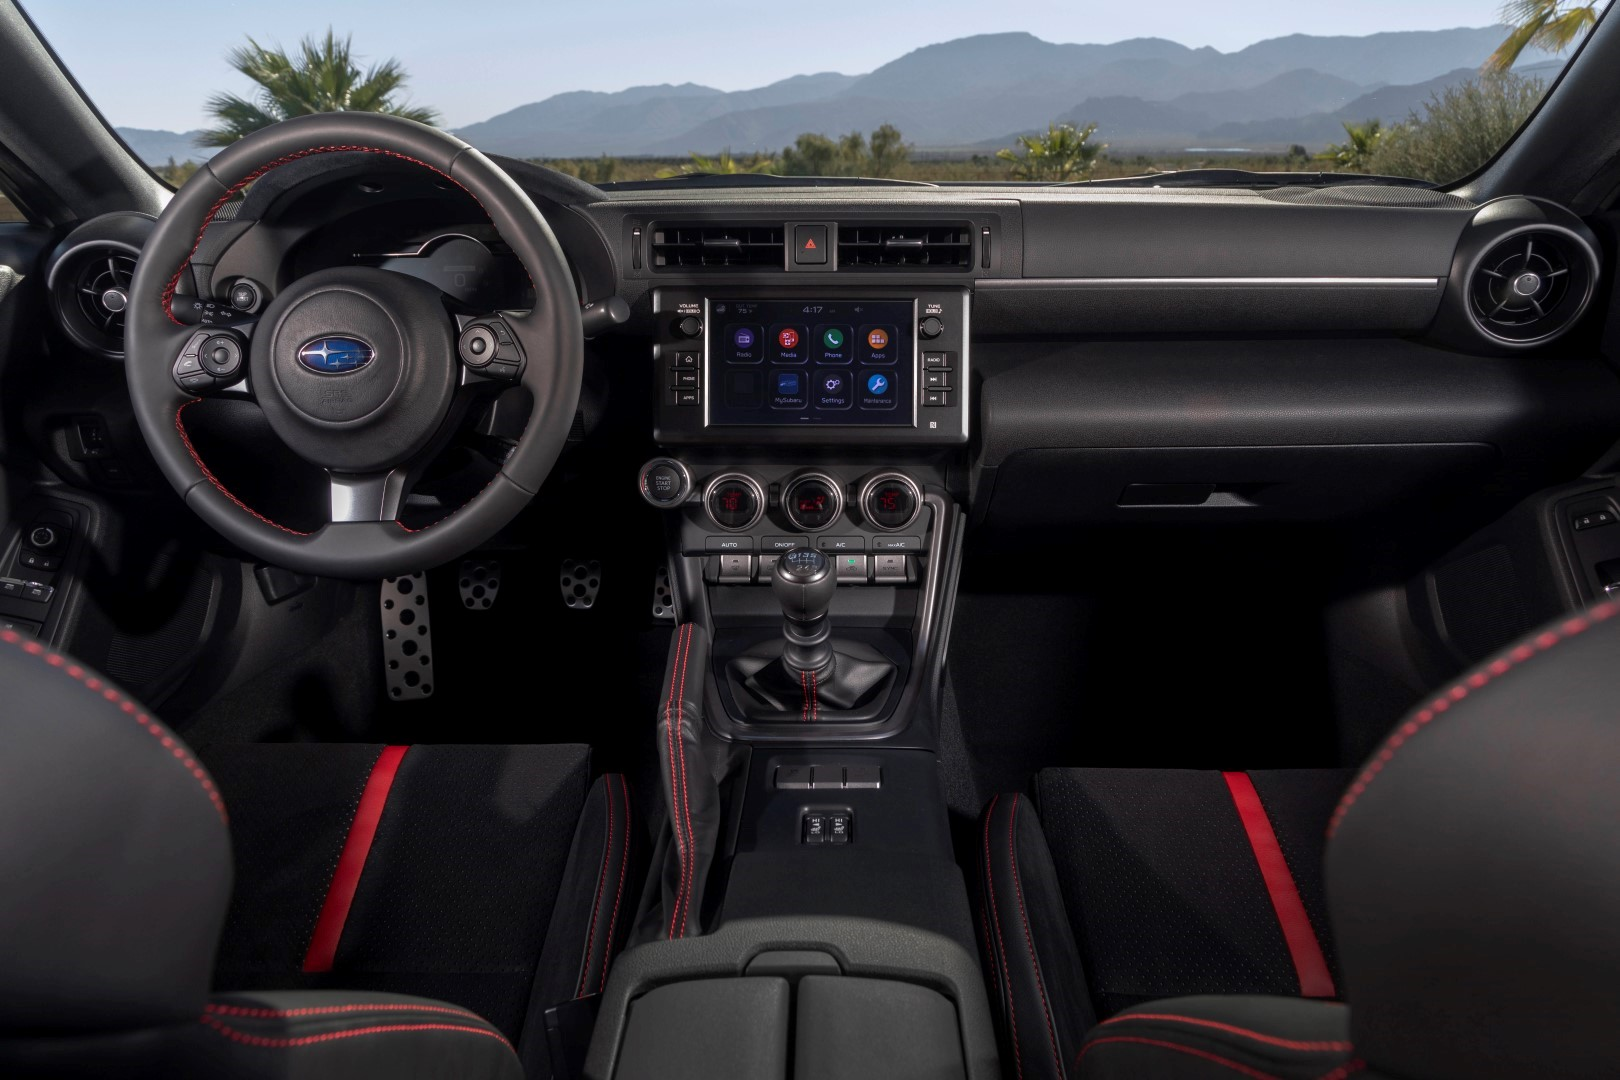 2020 Subaru BRZ (24)